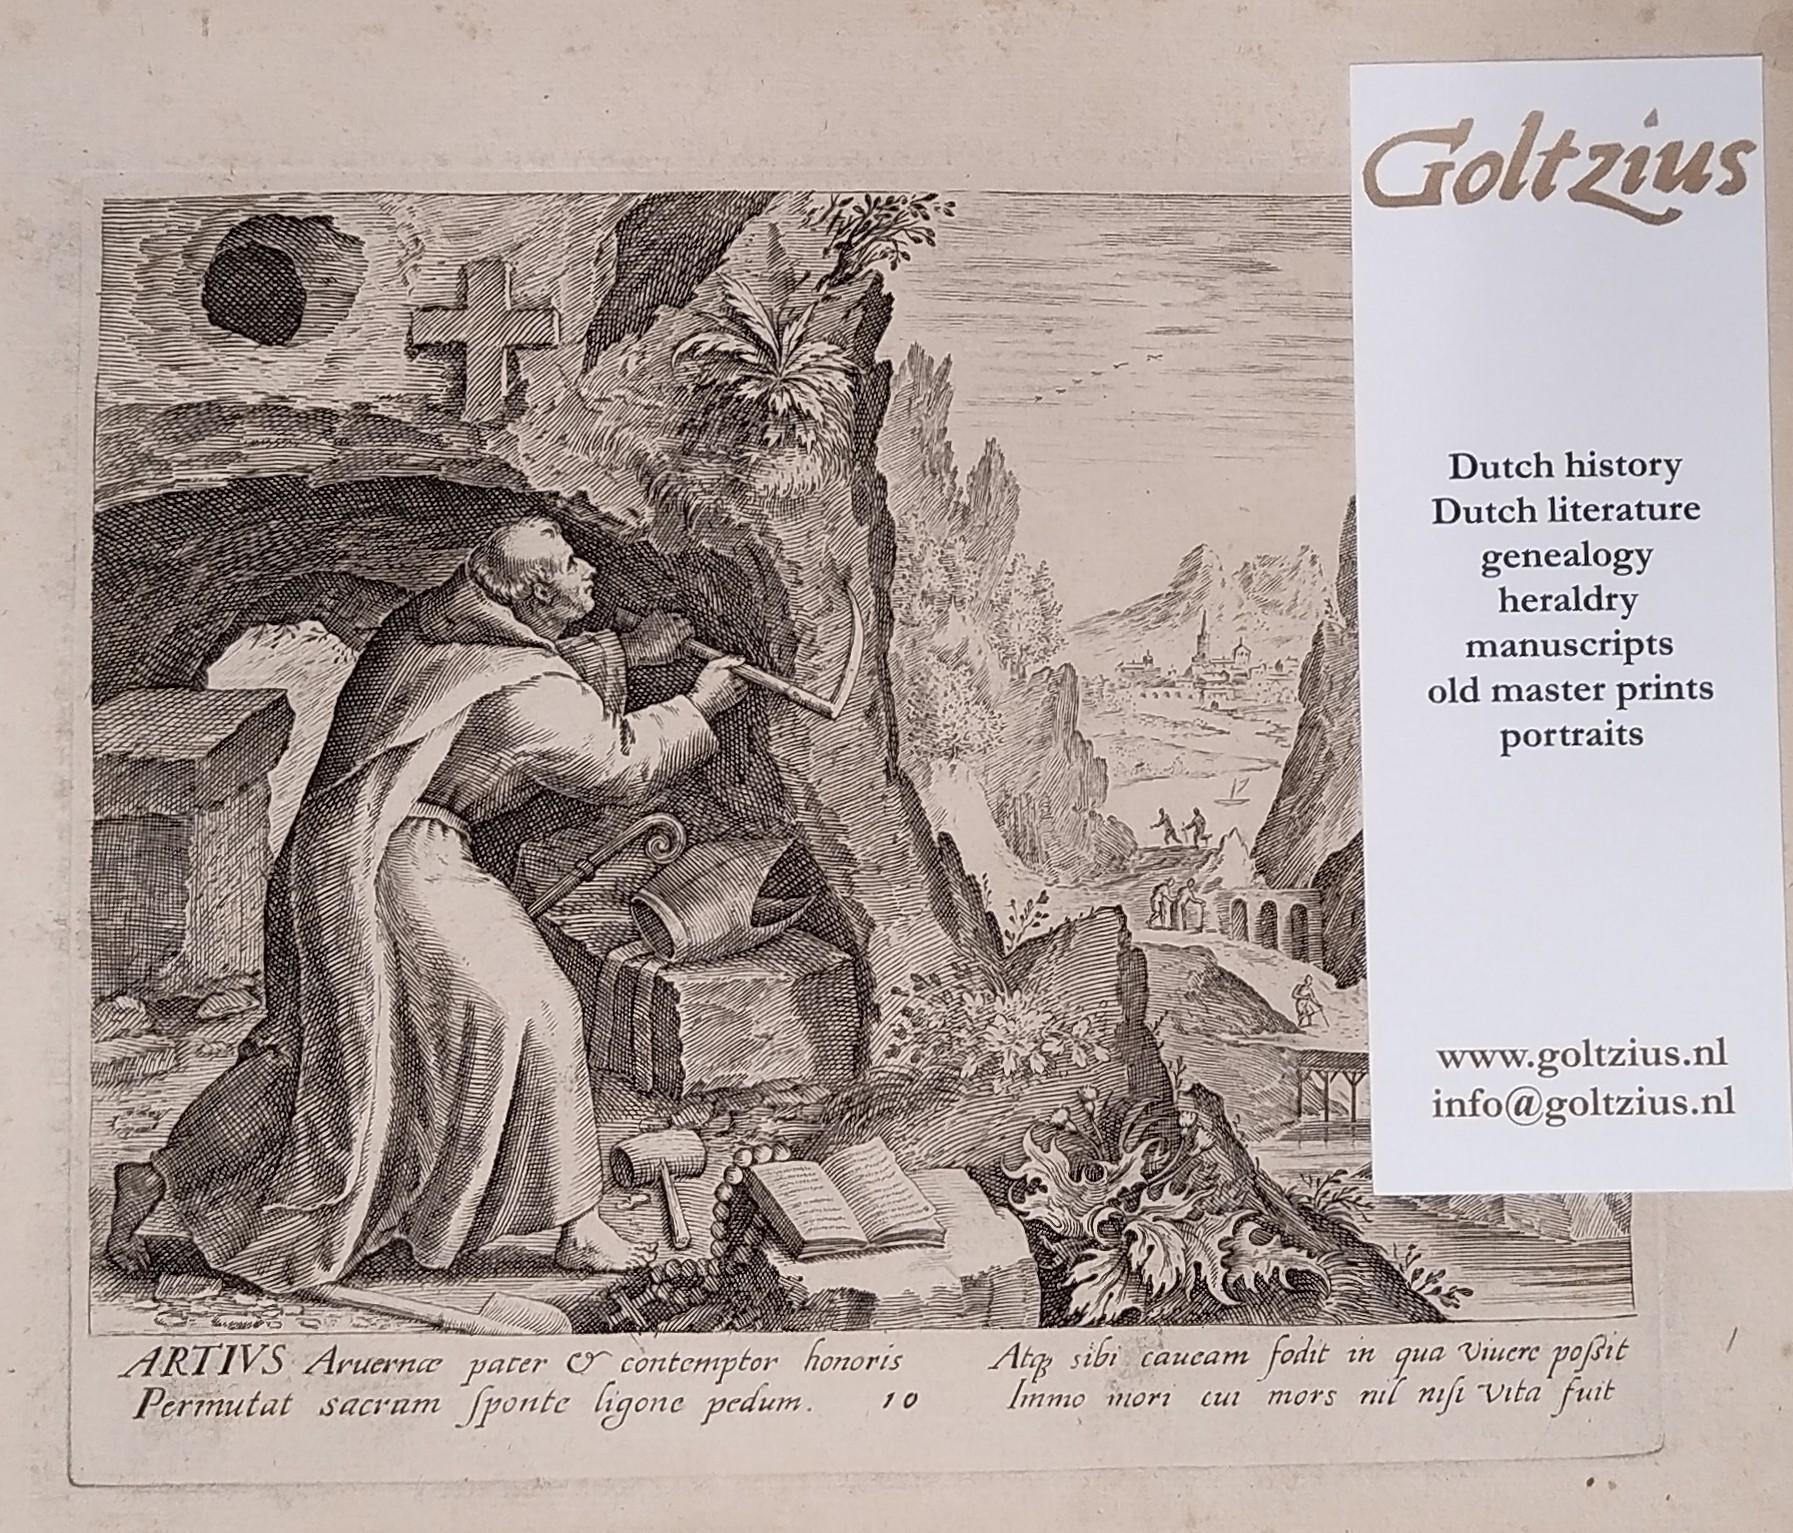 Unknown master, after Sadeler, Raphael I (1560-1632) and Sadeler, Johannes I (1550-1600), after Vos, Maarten de (1532-1603) [M]ARTIVS ... (SYLVAE SACRAE MONUMENTA... ANACHORETARUM)